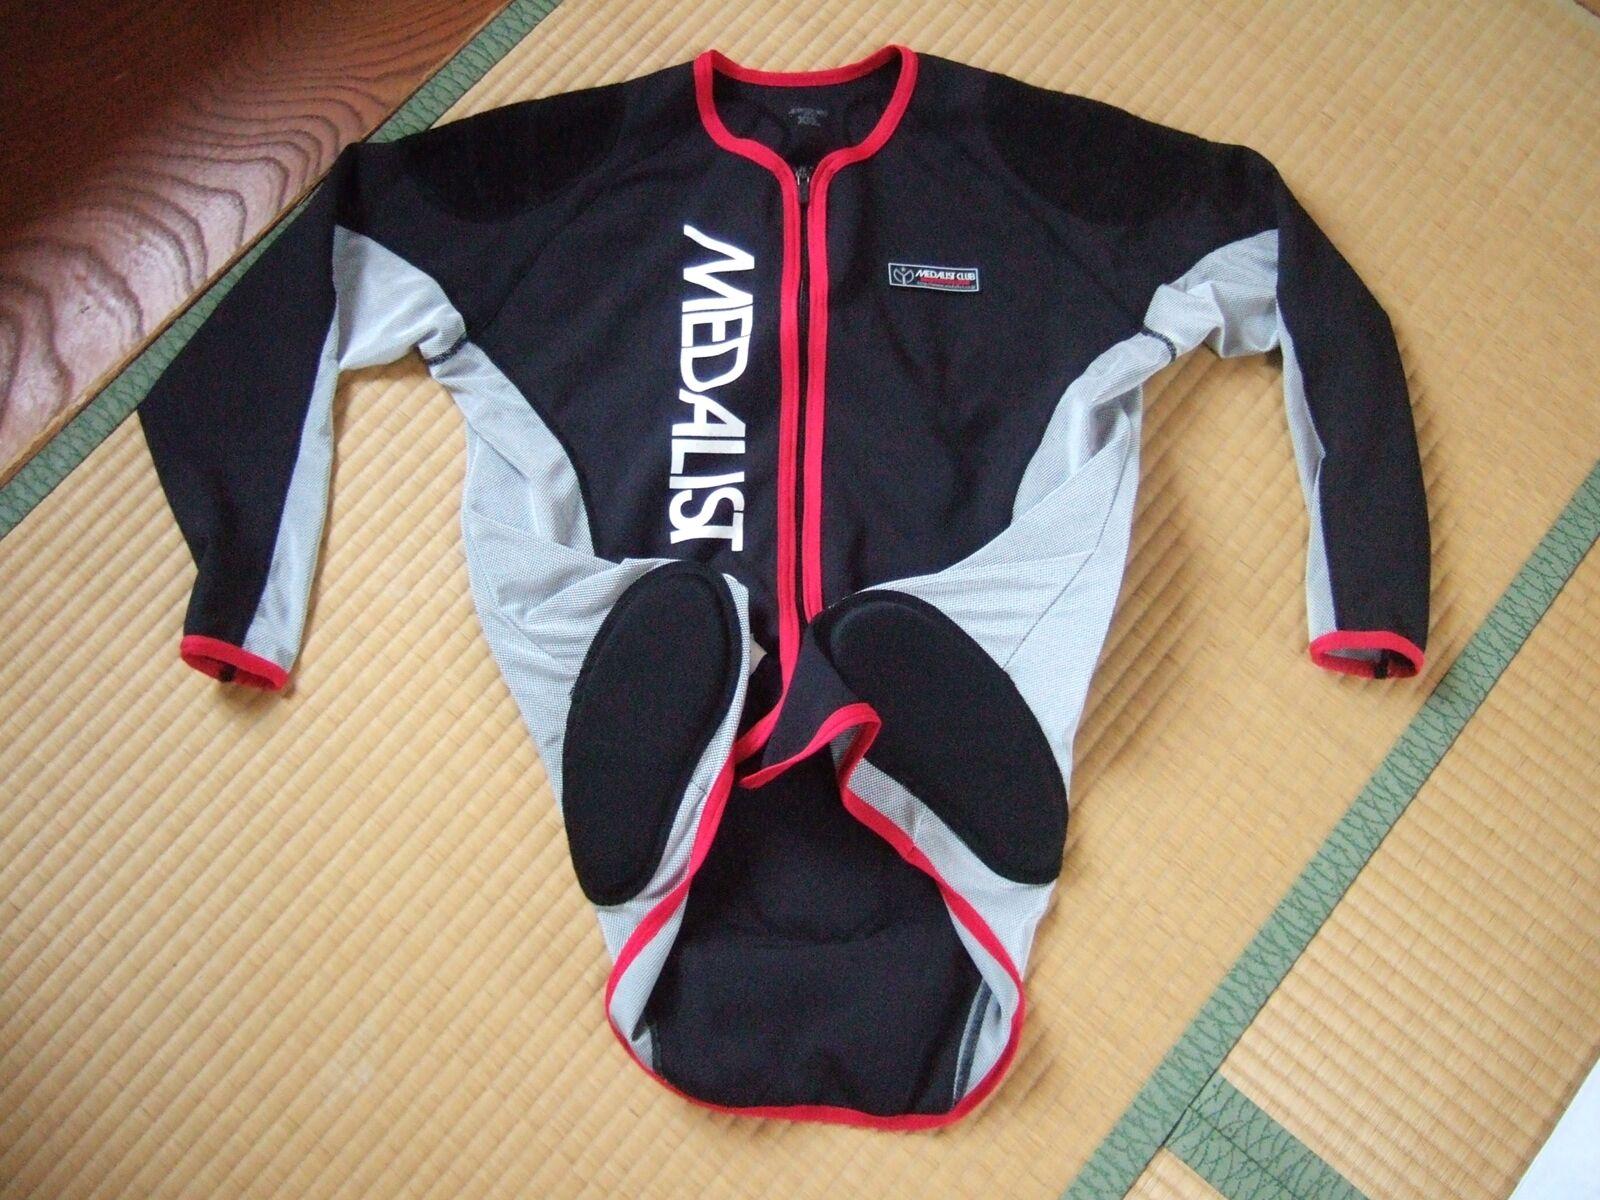 MEDALIST CLUB Pista Ciclismo armadura Yoroi